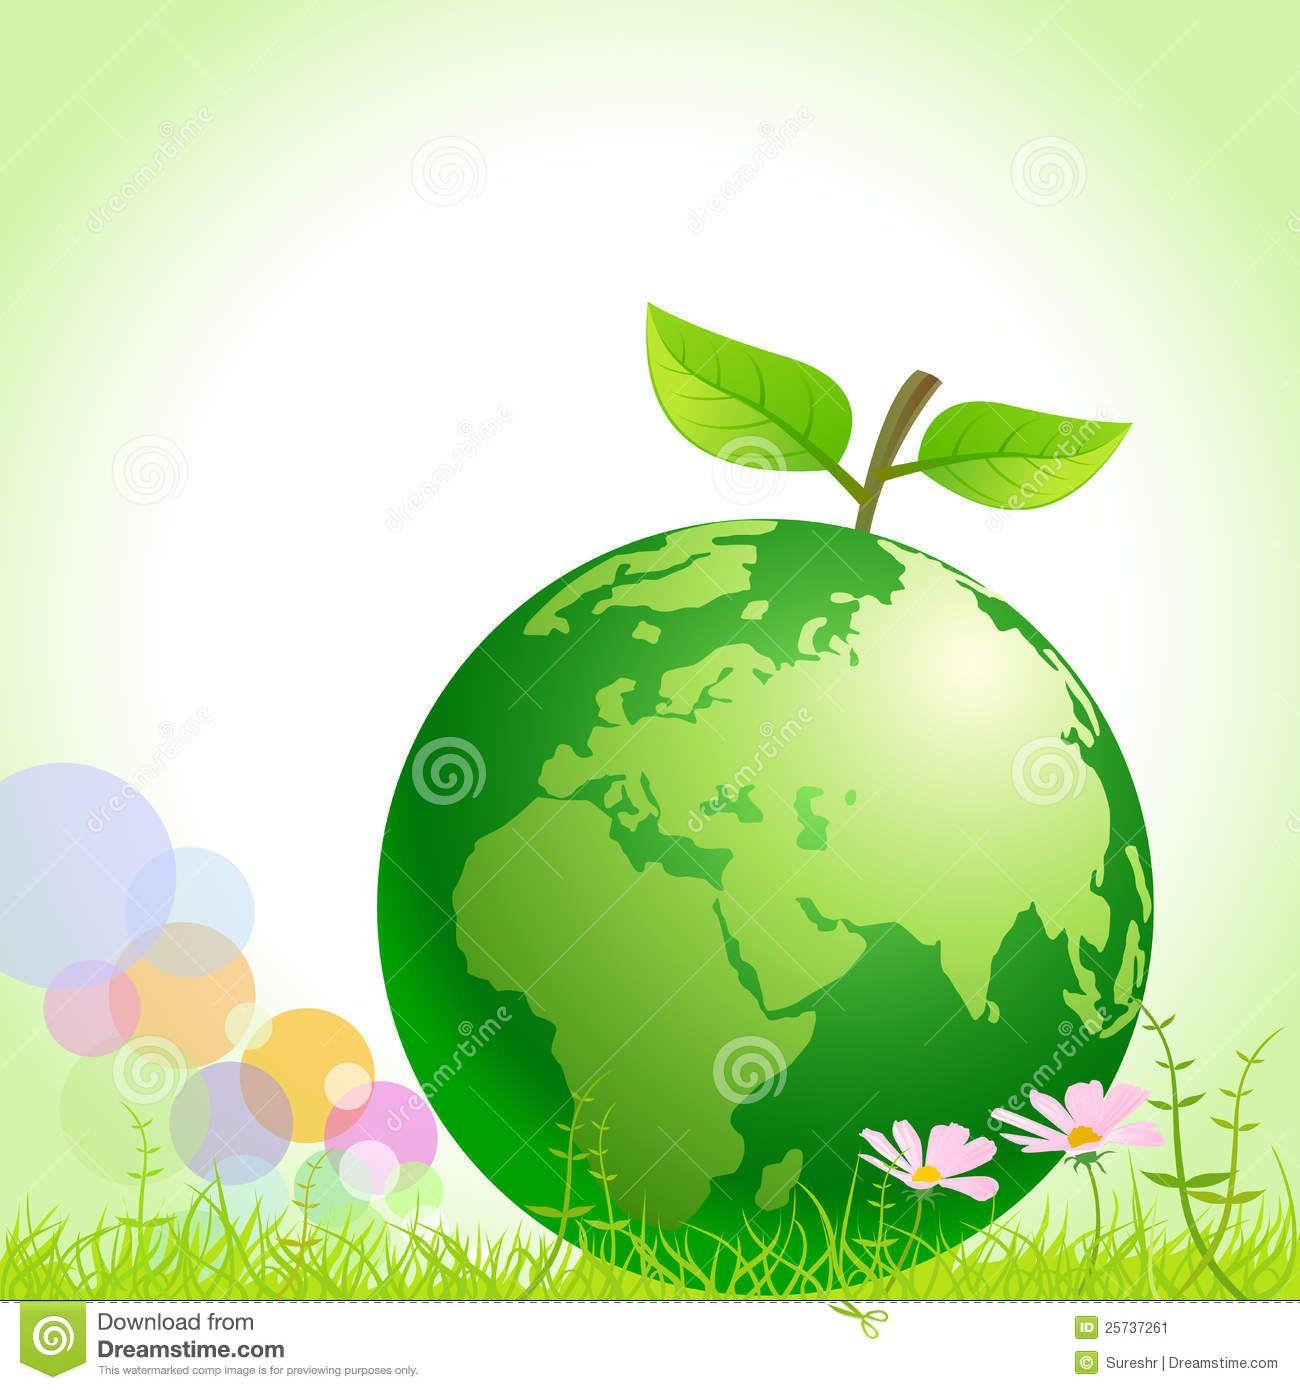 Green Earth Save Environment Stock Save Environment Environment Save Our Earth